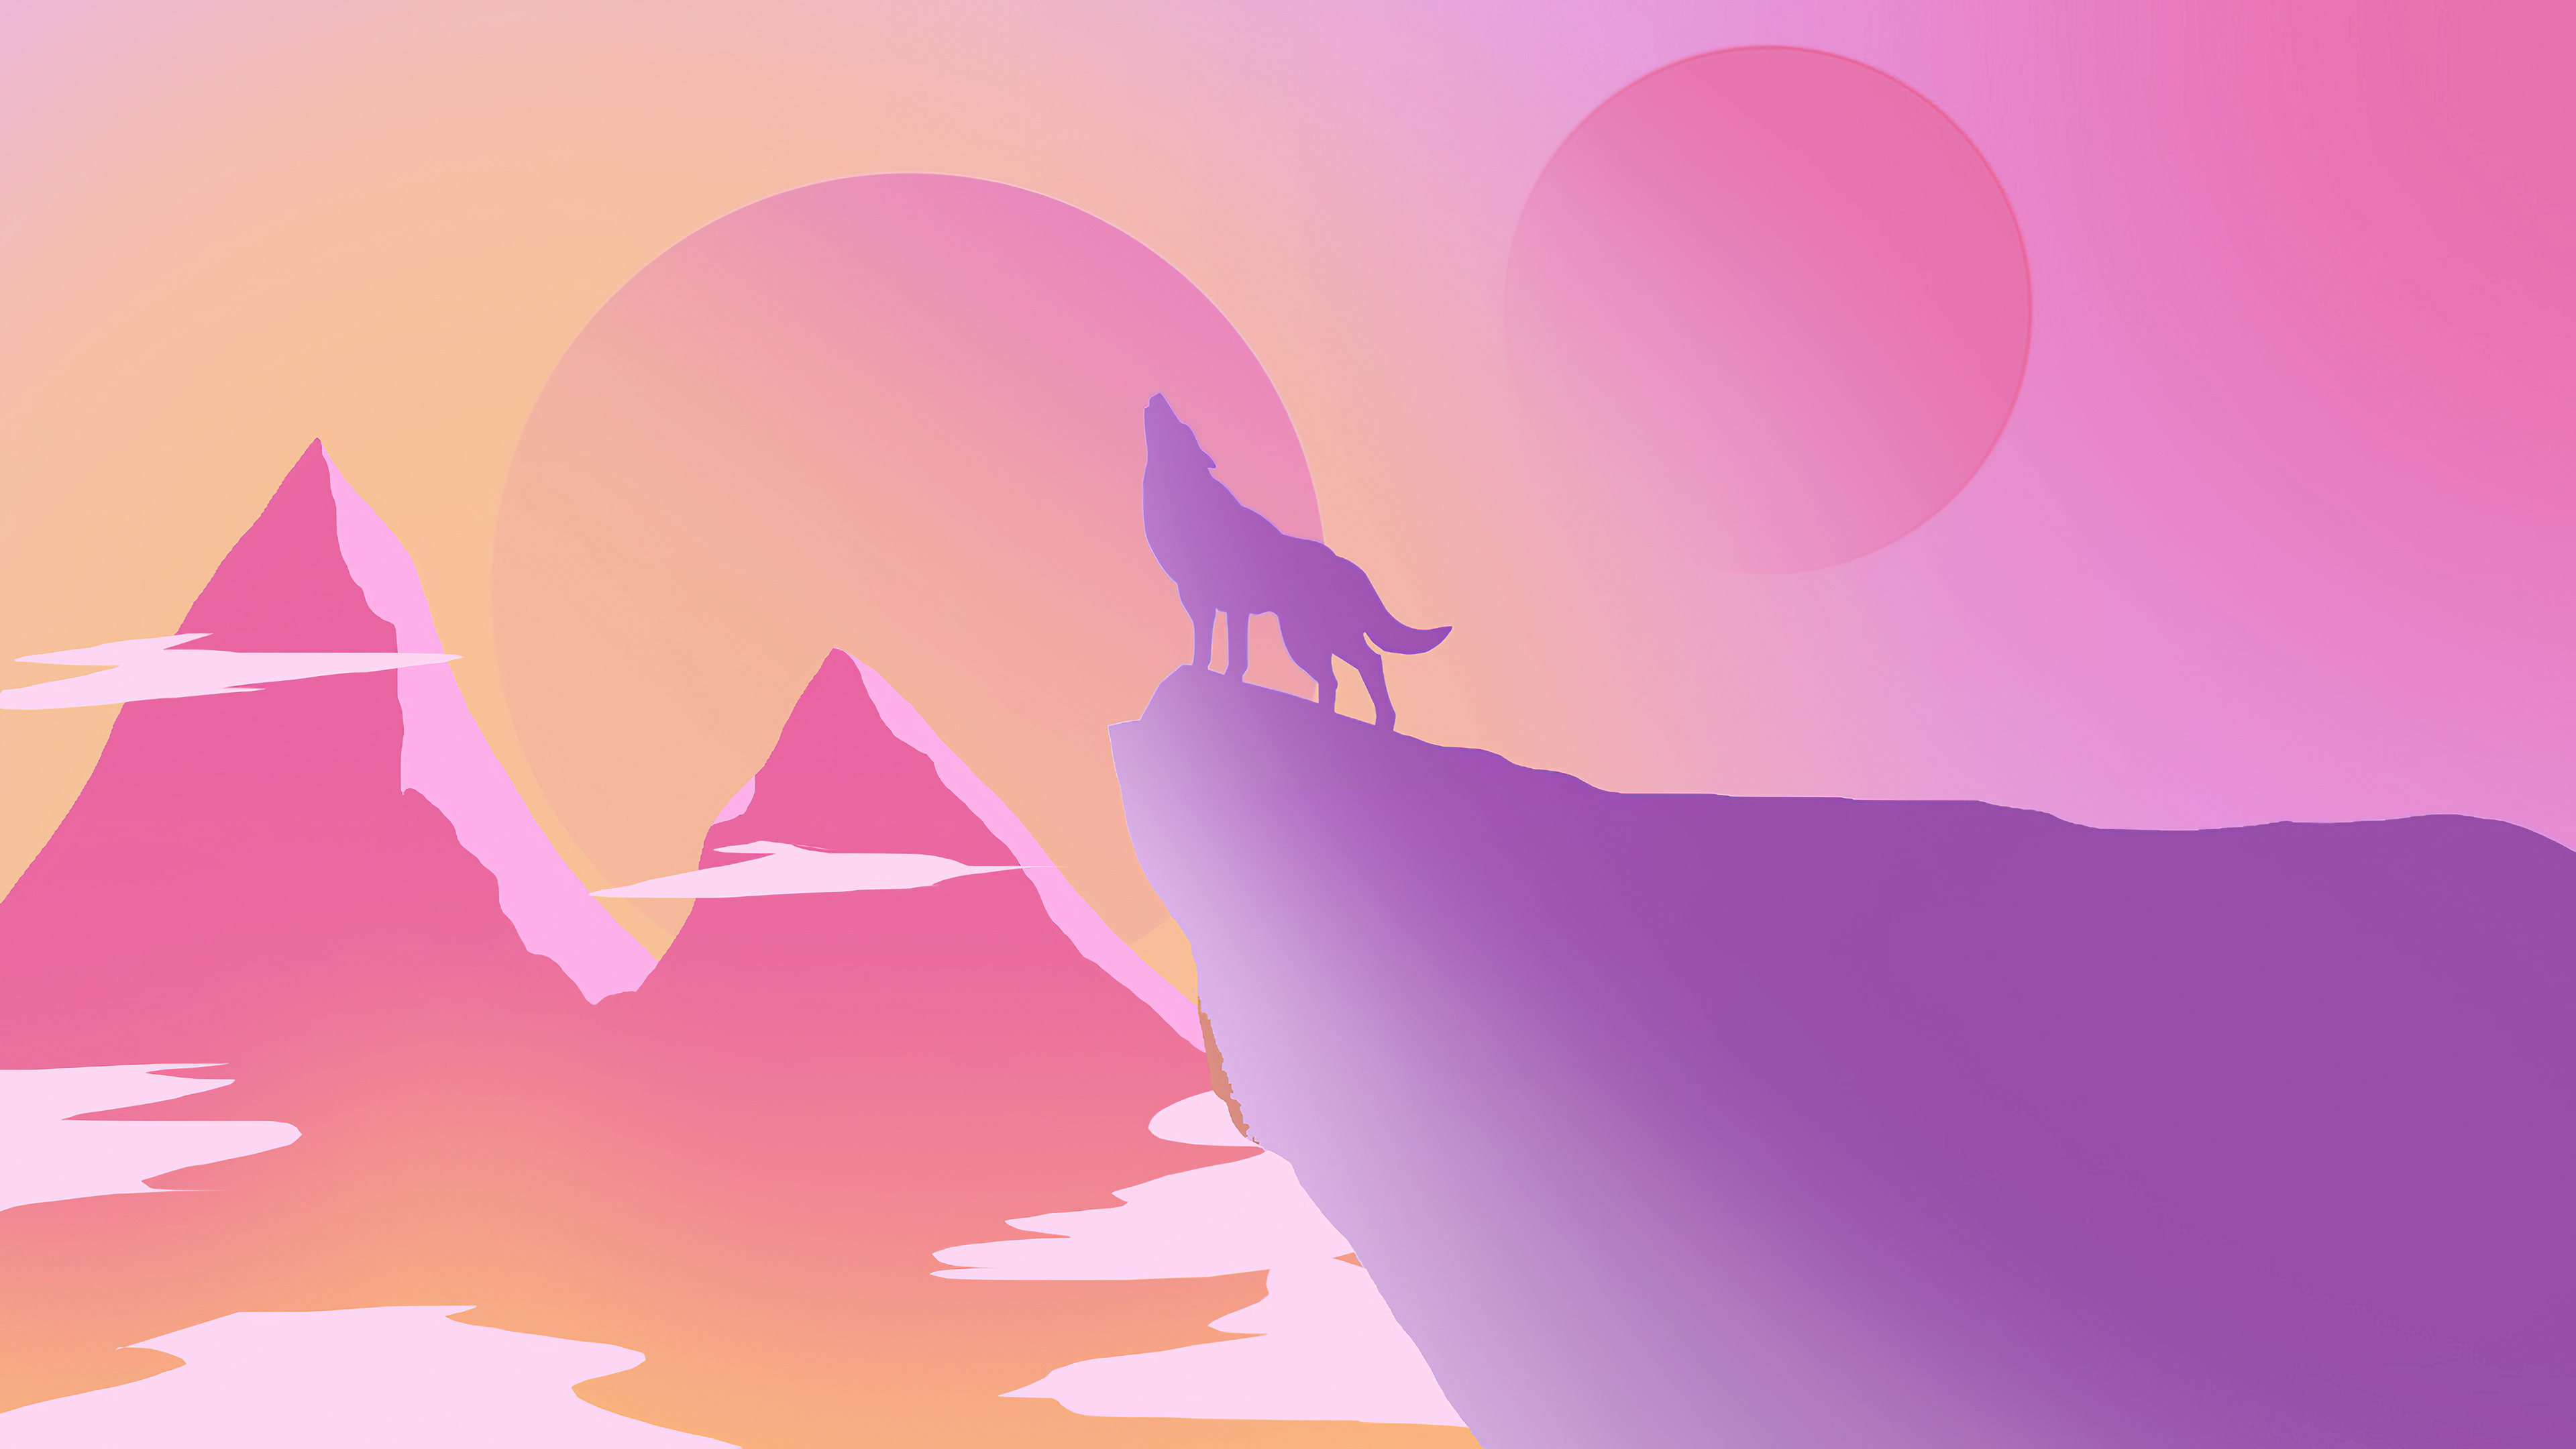 lone wolf howling minimal 4k 1608622906 - Lone Wolf Howling Minimal 4k - Lone Wolf Howling Minimal 4k wallpapers